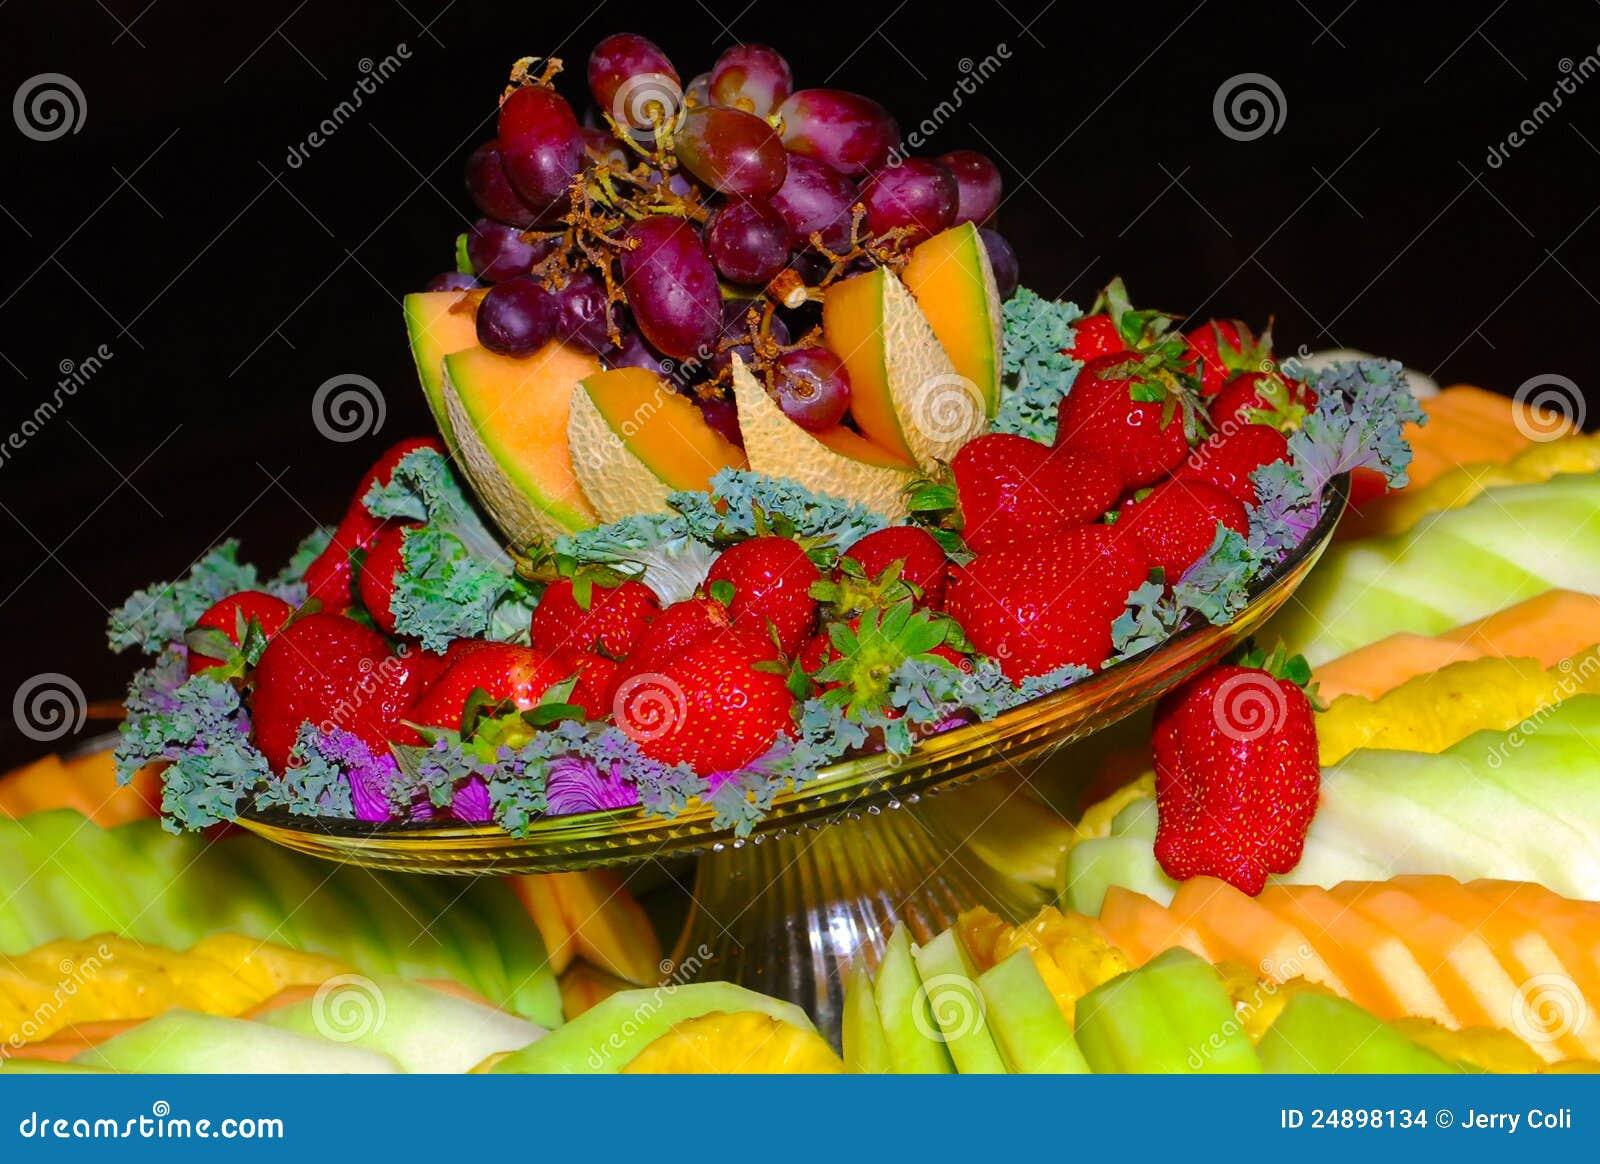 Beautiful fruit pictures - Beautiful Fruit Tray